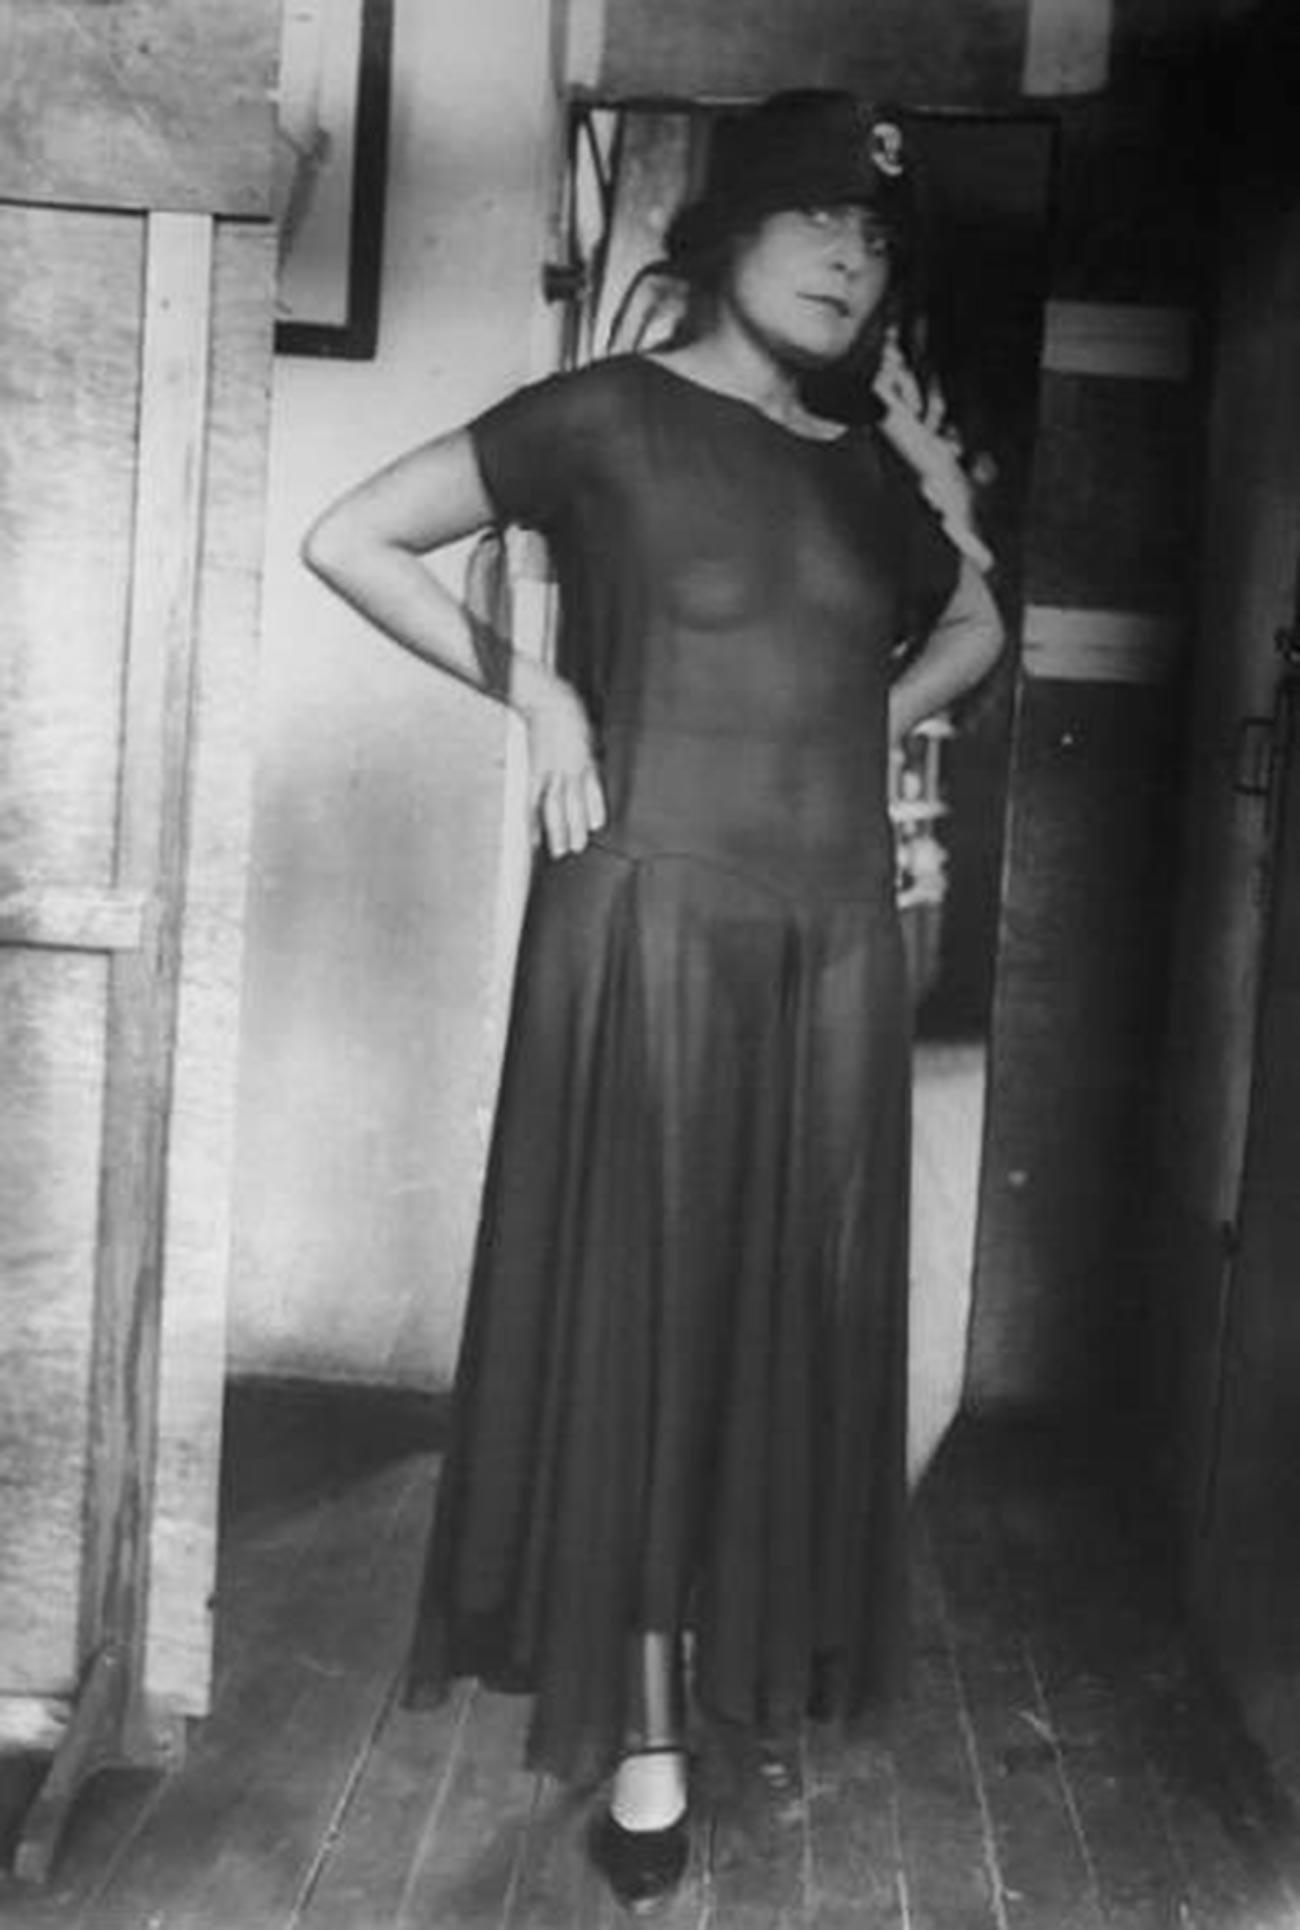 Lili Brik, la muse du poète Vladimir Maïakovski, dans une robe transparente, 1924